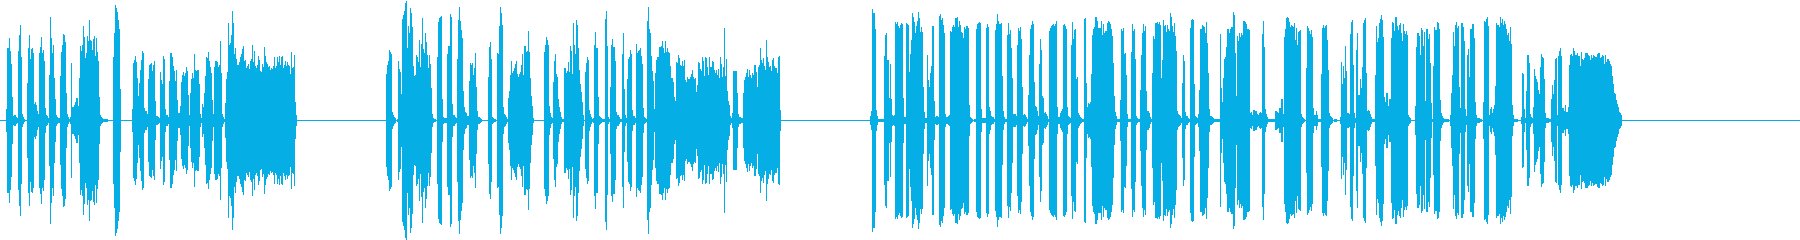 DJスクラッチパフォーマンス1-3の再生済みの波形